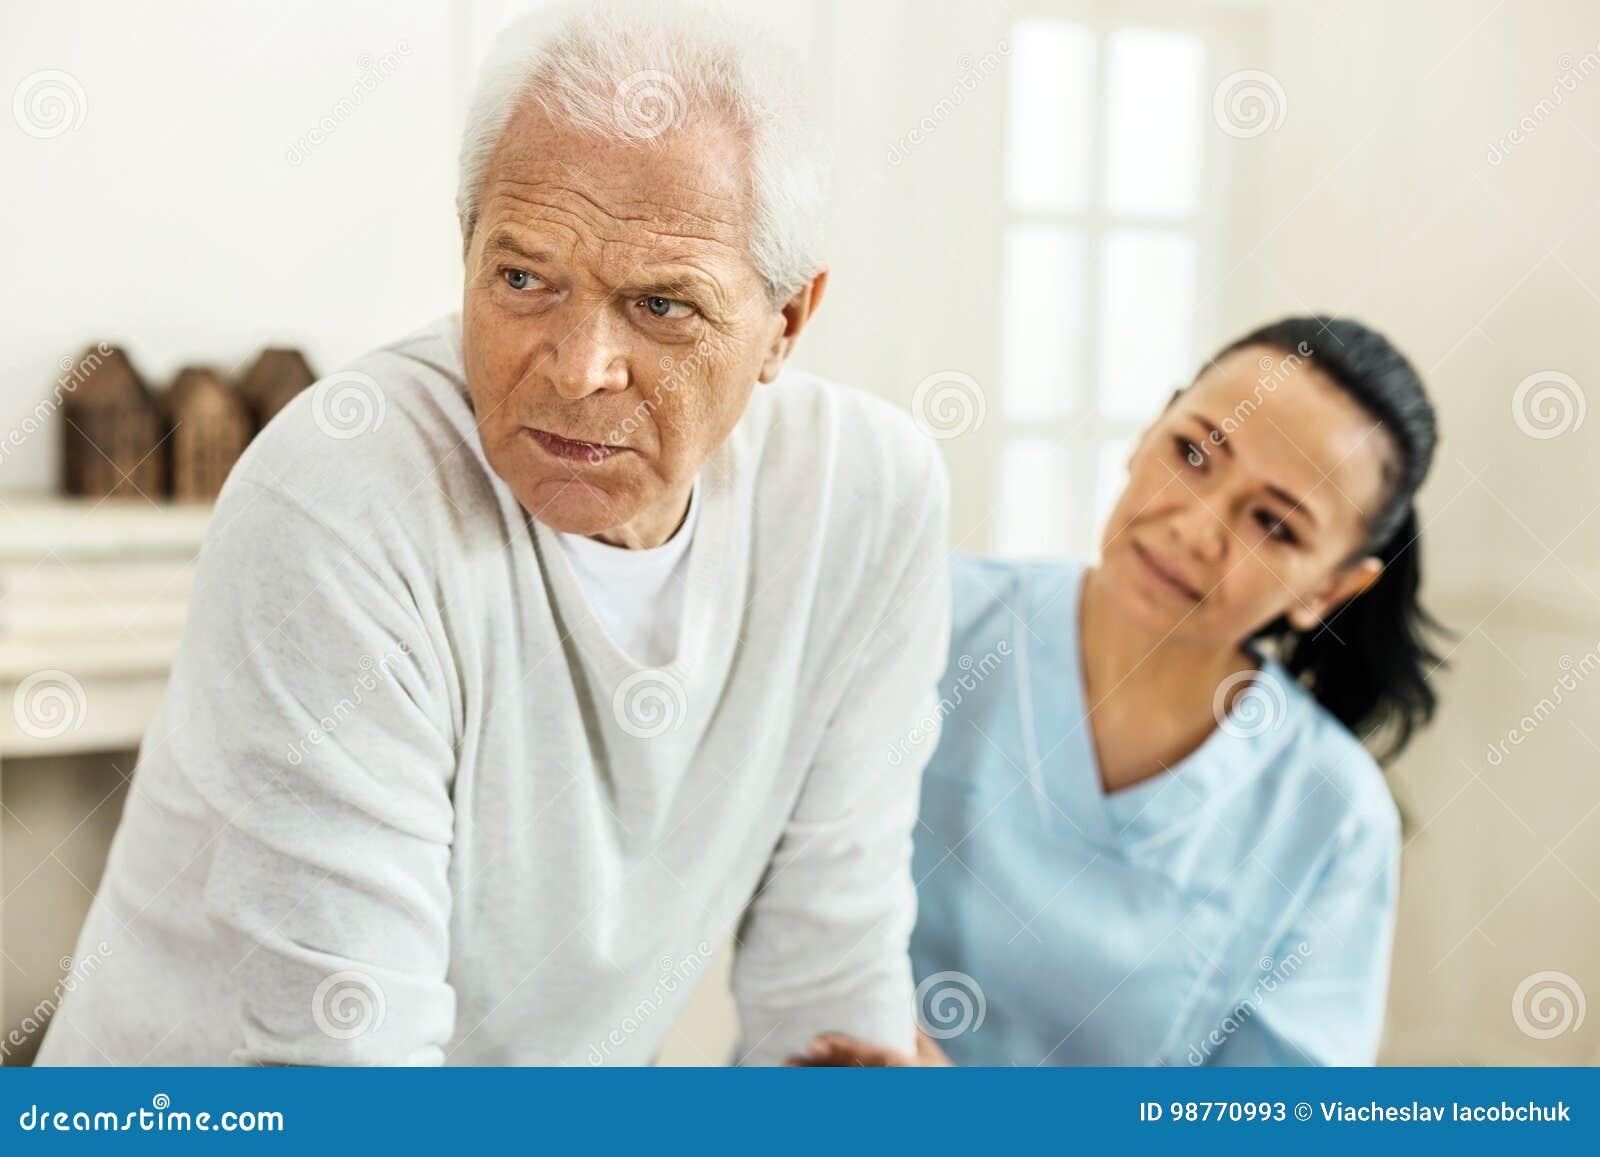 cheerless elderly man feeling depressed stock image image of